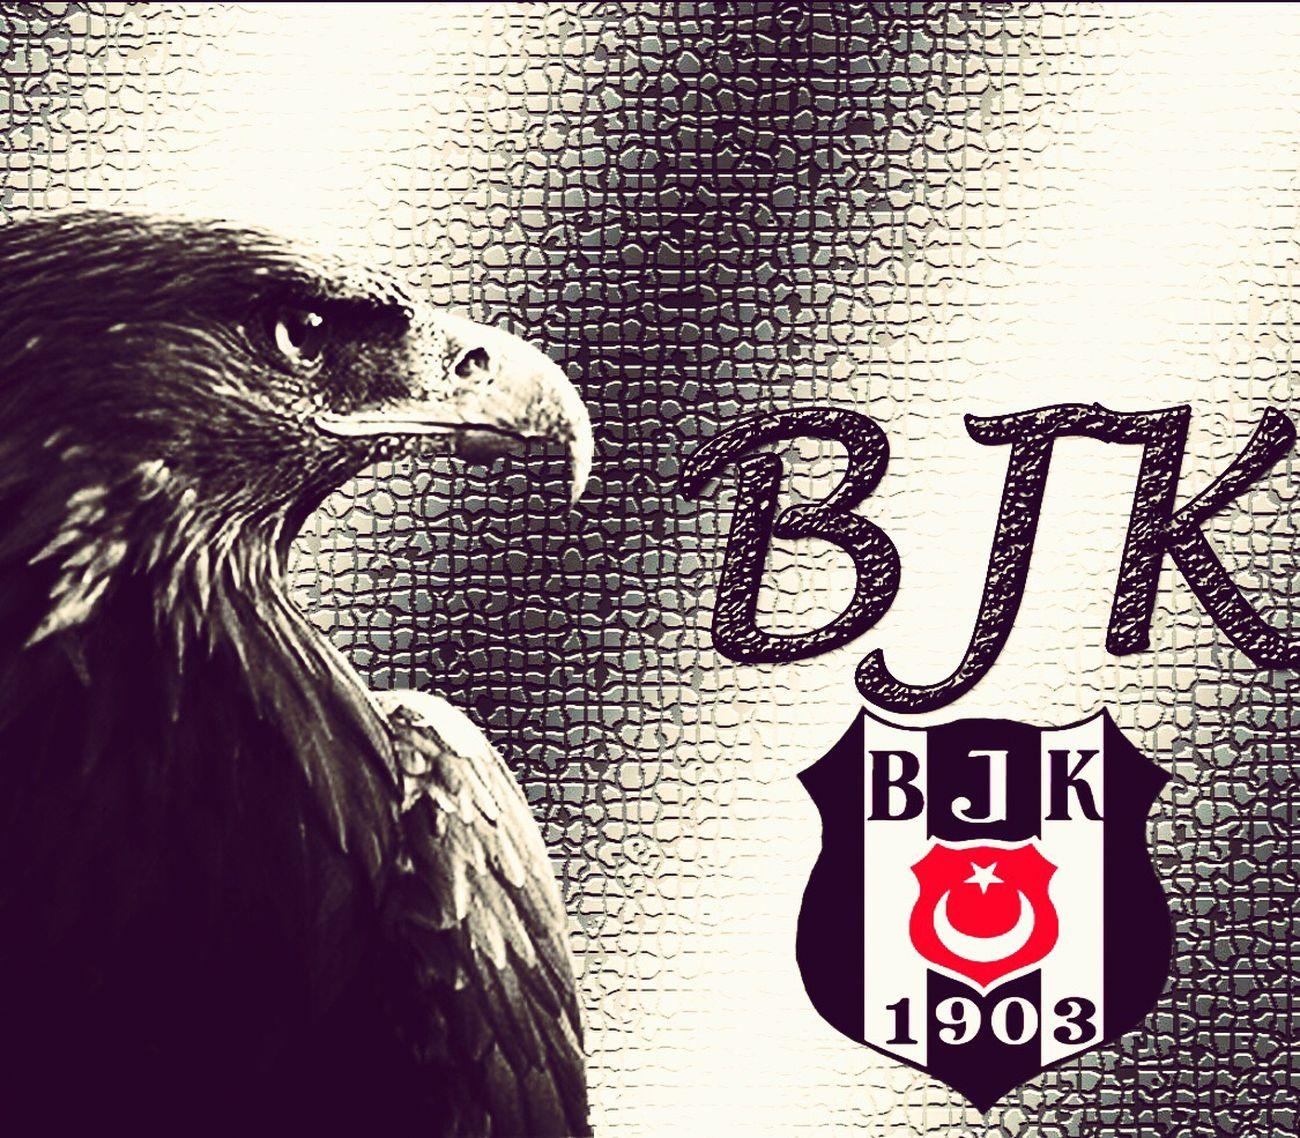 Beşiktaşk BJK BJK1903 Besiktas Beşiktaş ❤